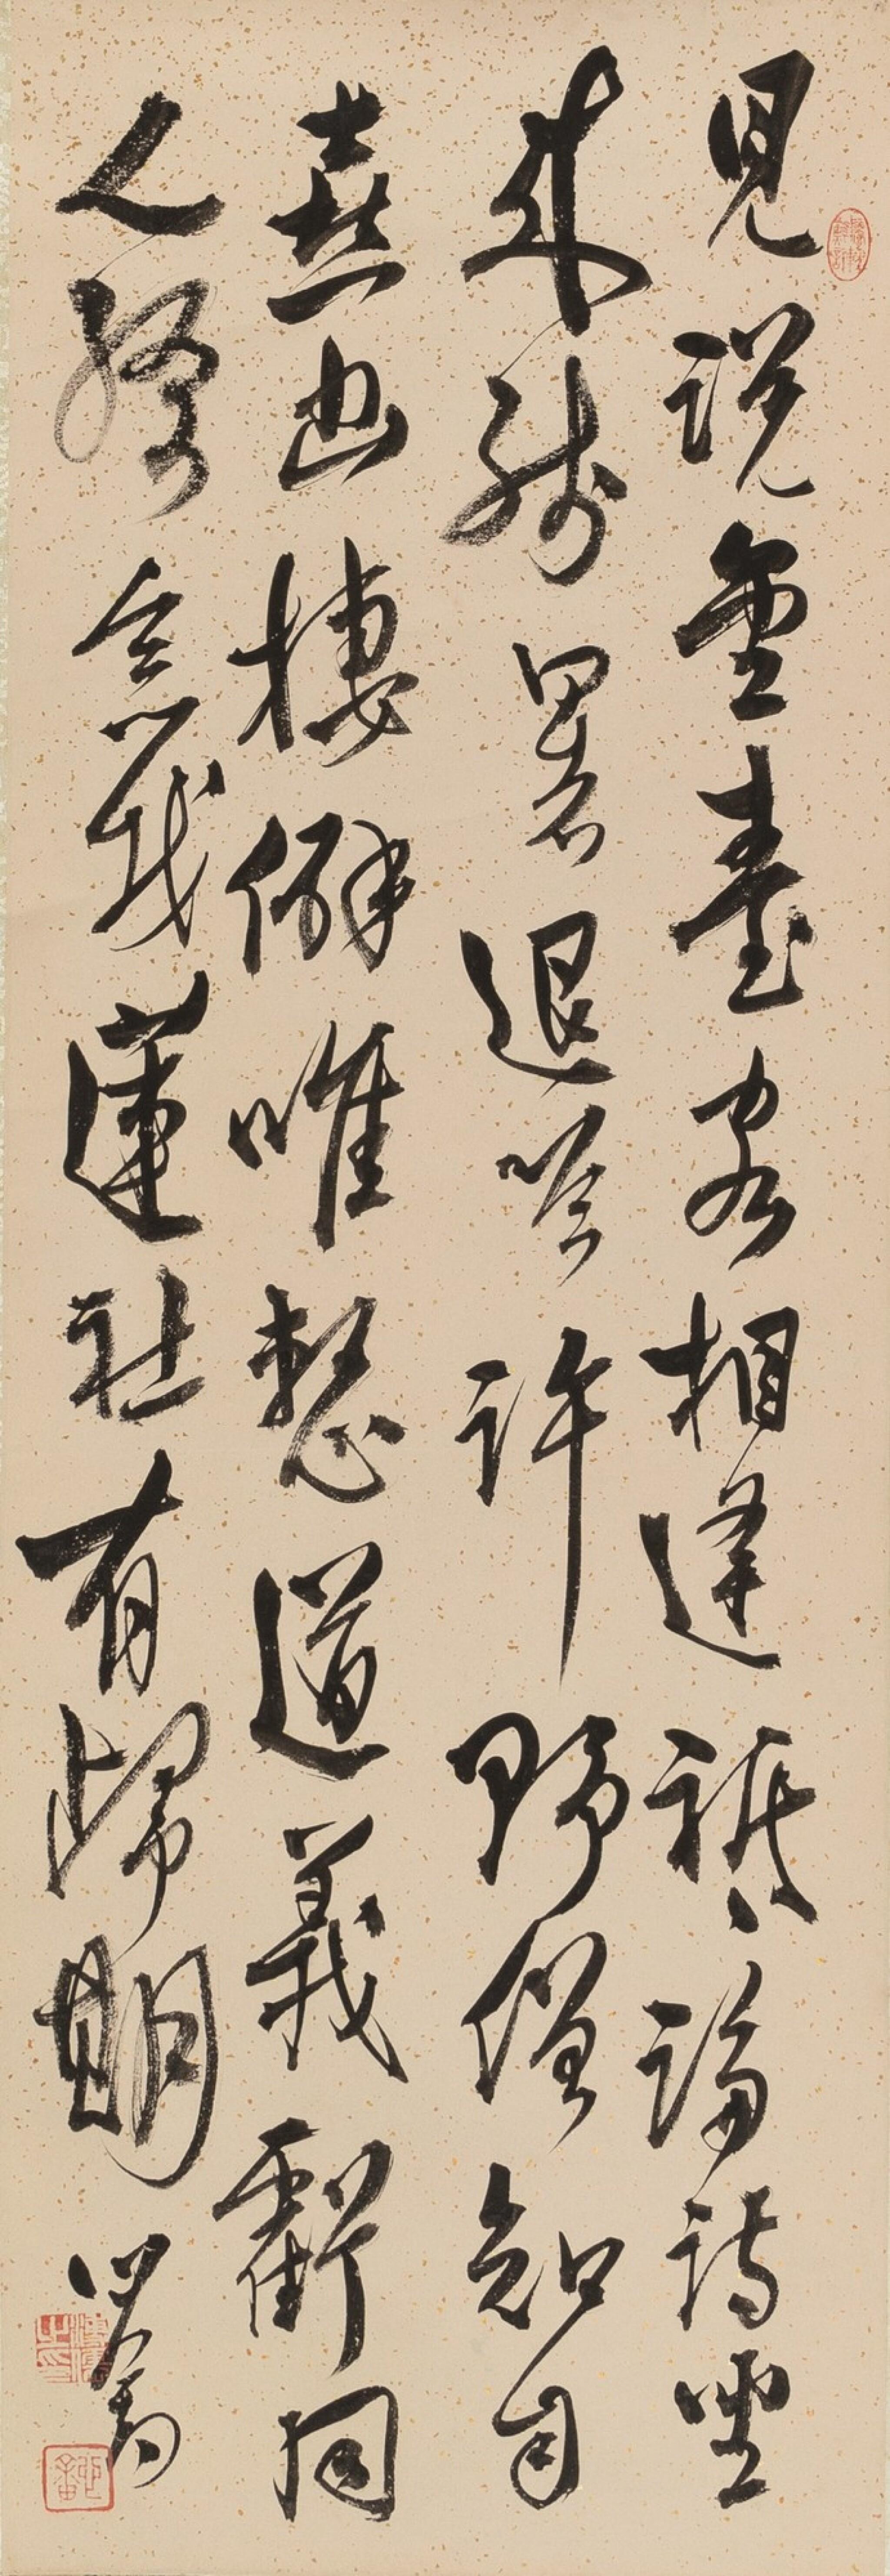 View 1 of Lot 131. Pu Ru (1896-1963) Poème en calligraphie de style courant | 溥儒 行書詩句 | Pu Ru (1896-1963) Poem in Running Script.